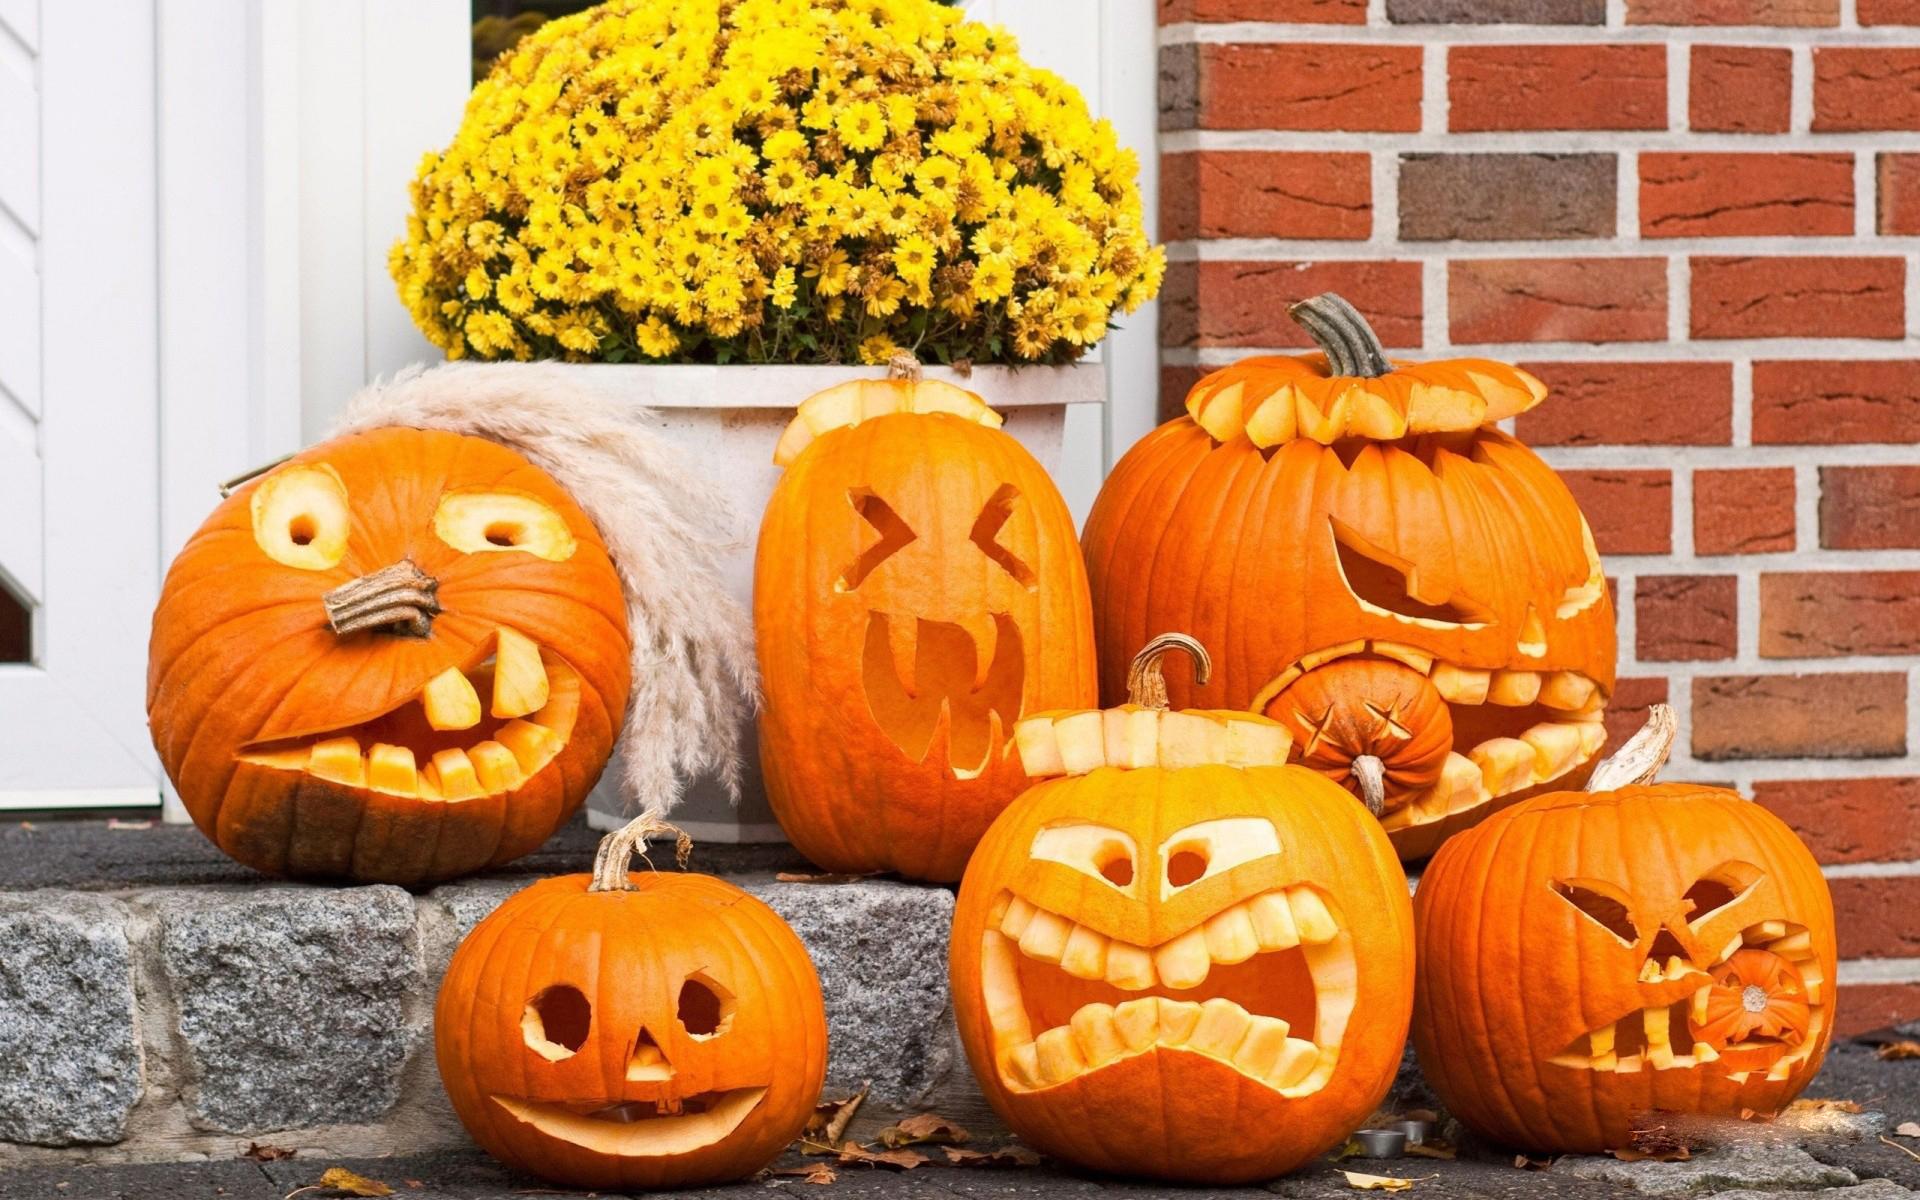 Fall Leaves And Pumpkins Wallpaper Free Hd Pumpkin Wallpapers Pixelstalk Net